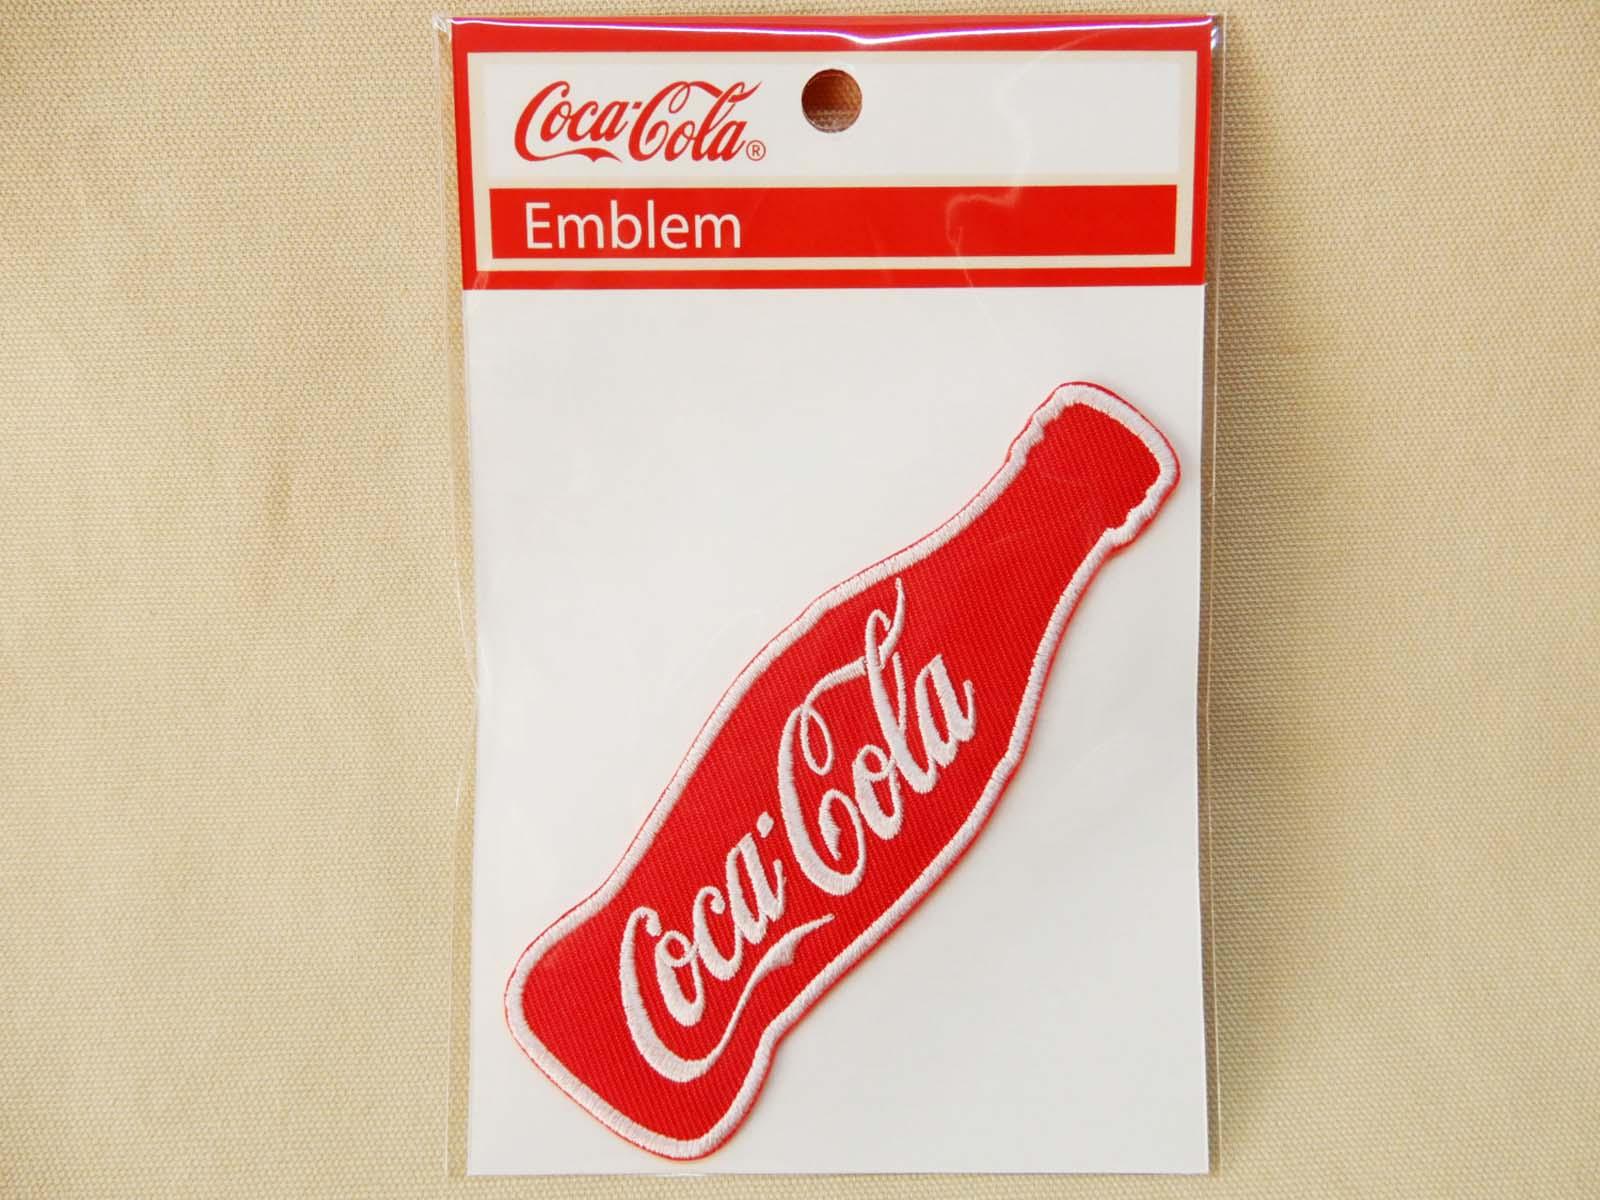 Coca-Cola★CC-E9★コカ・コーラ ワッペン★EMBLEM☆Coca-Cola ボトル /コカ・コーラ